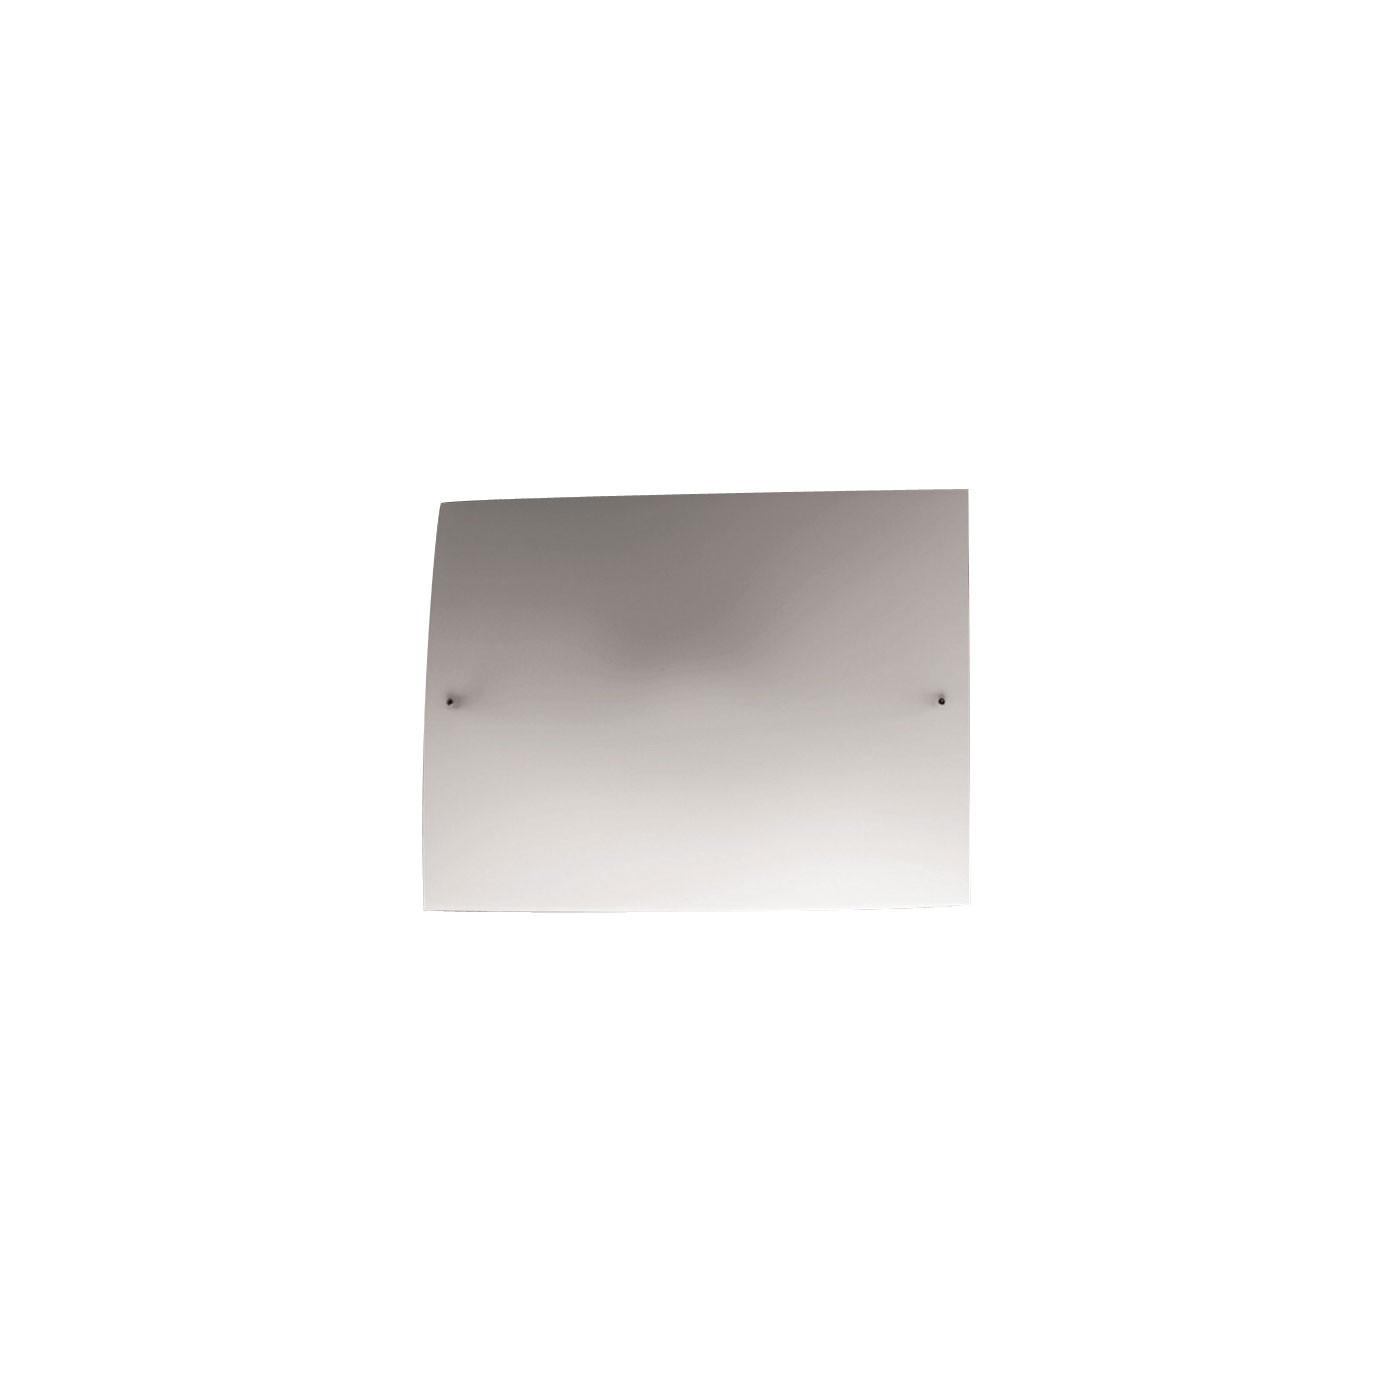 Foscarini Folio Parete.Foscarini Folio Grande Parete Wall Lamp At Nostraforma